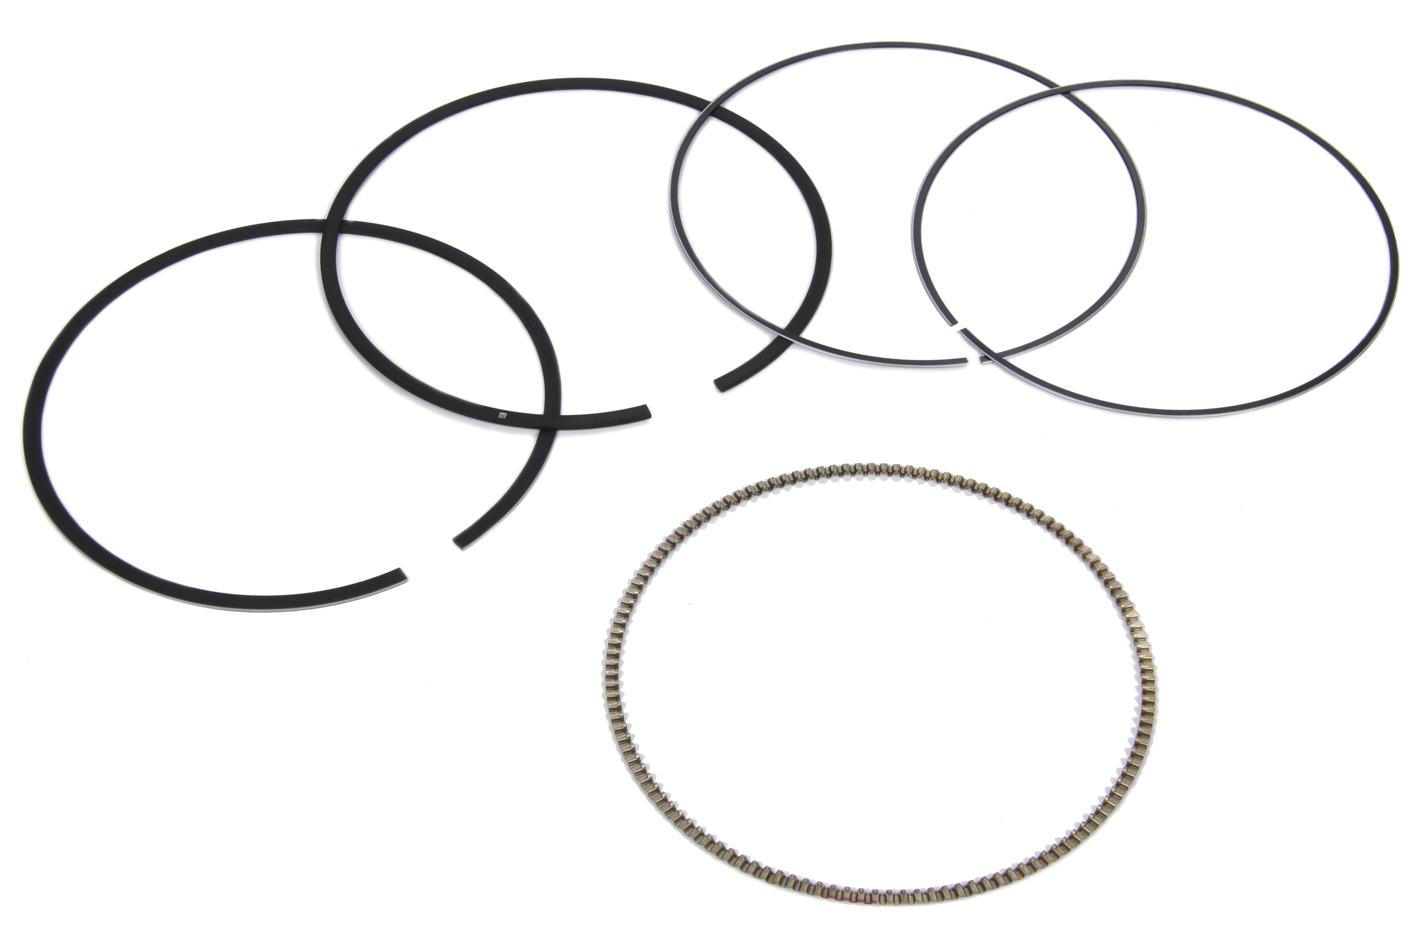 Piston Ring 4.040 (1pk) 1.0mm 1.0mm 2.0mm